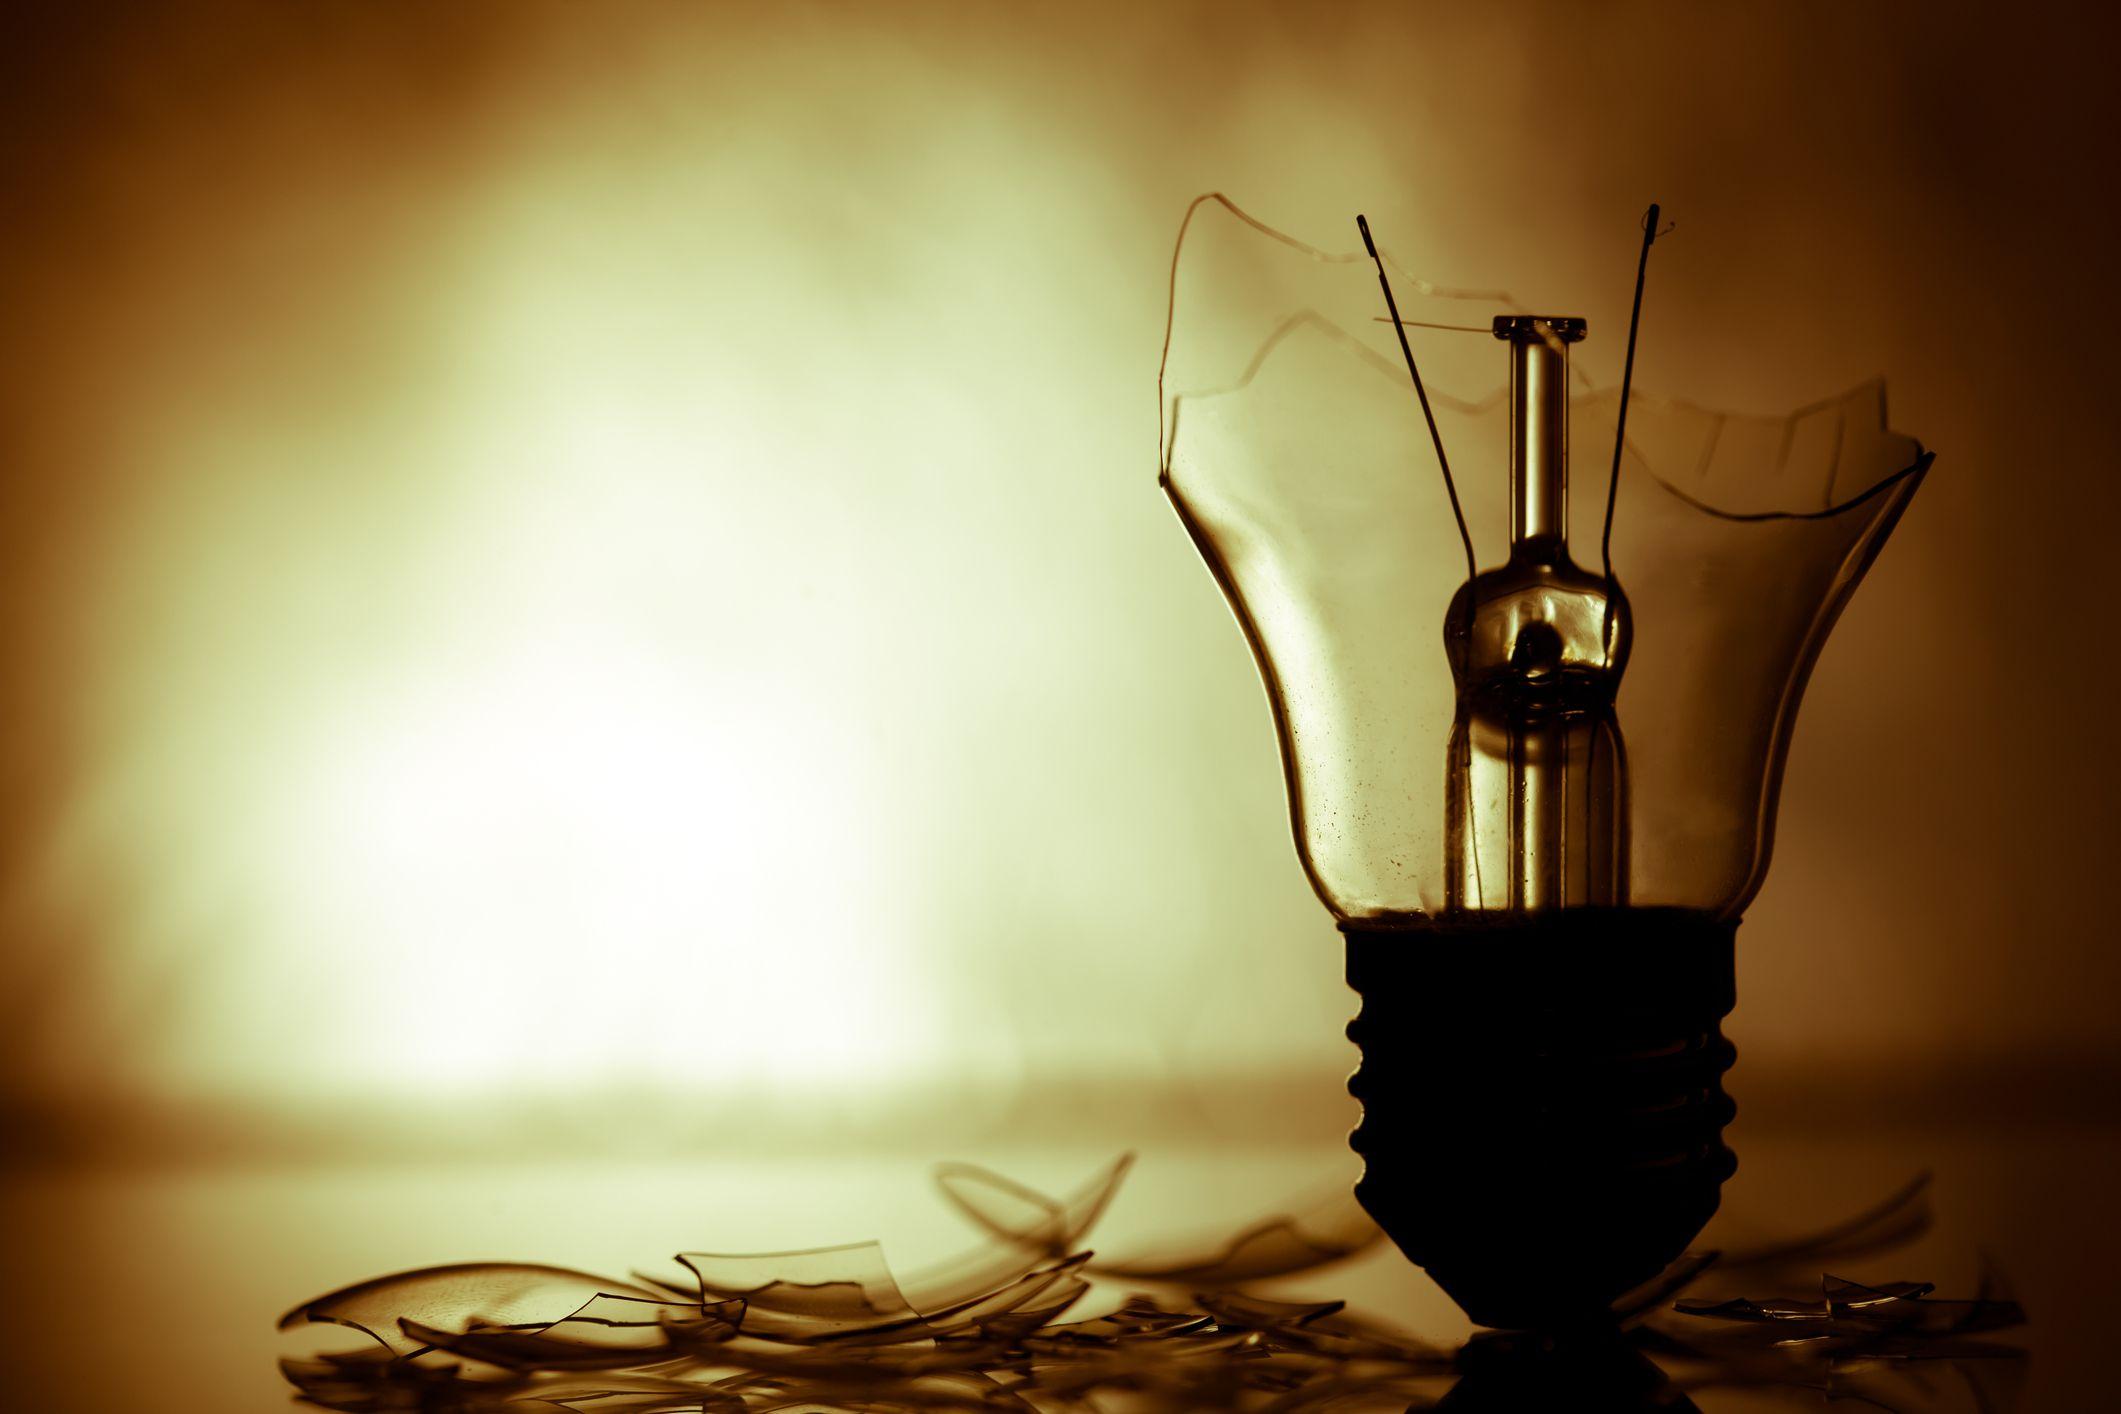 Burnt out bulb